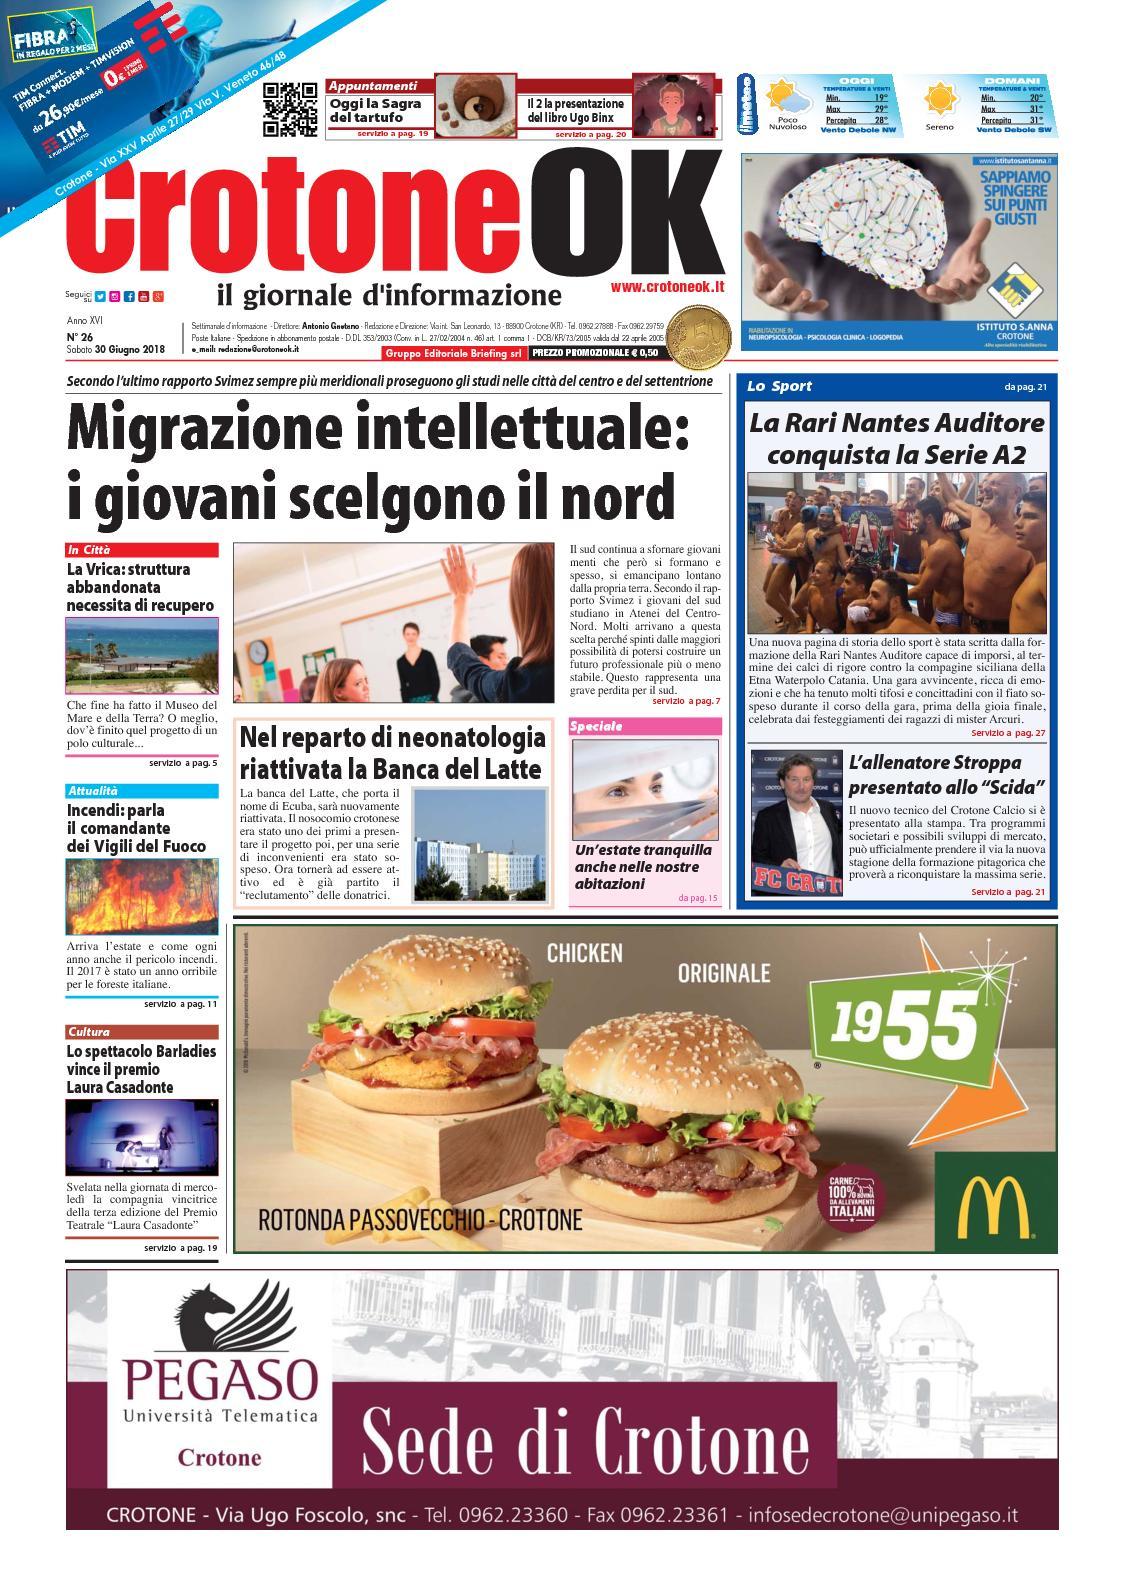 Calaméo Giornale Crotoneok N 26 2018